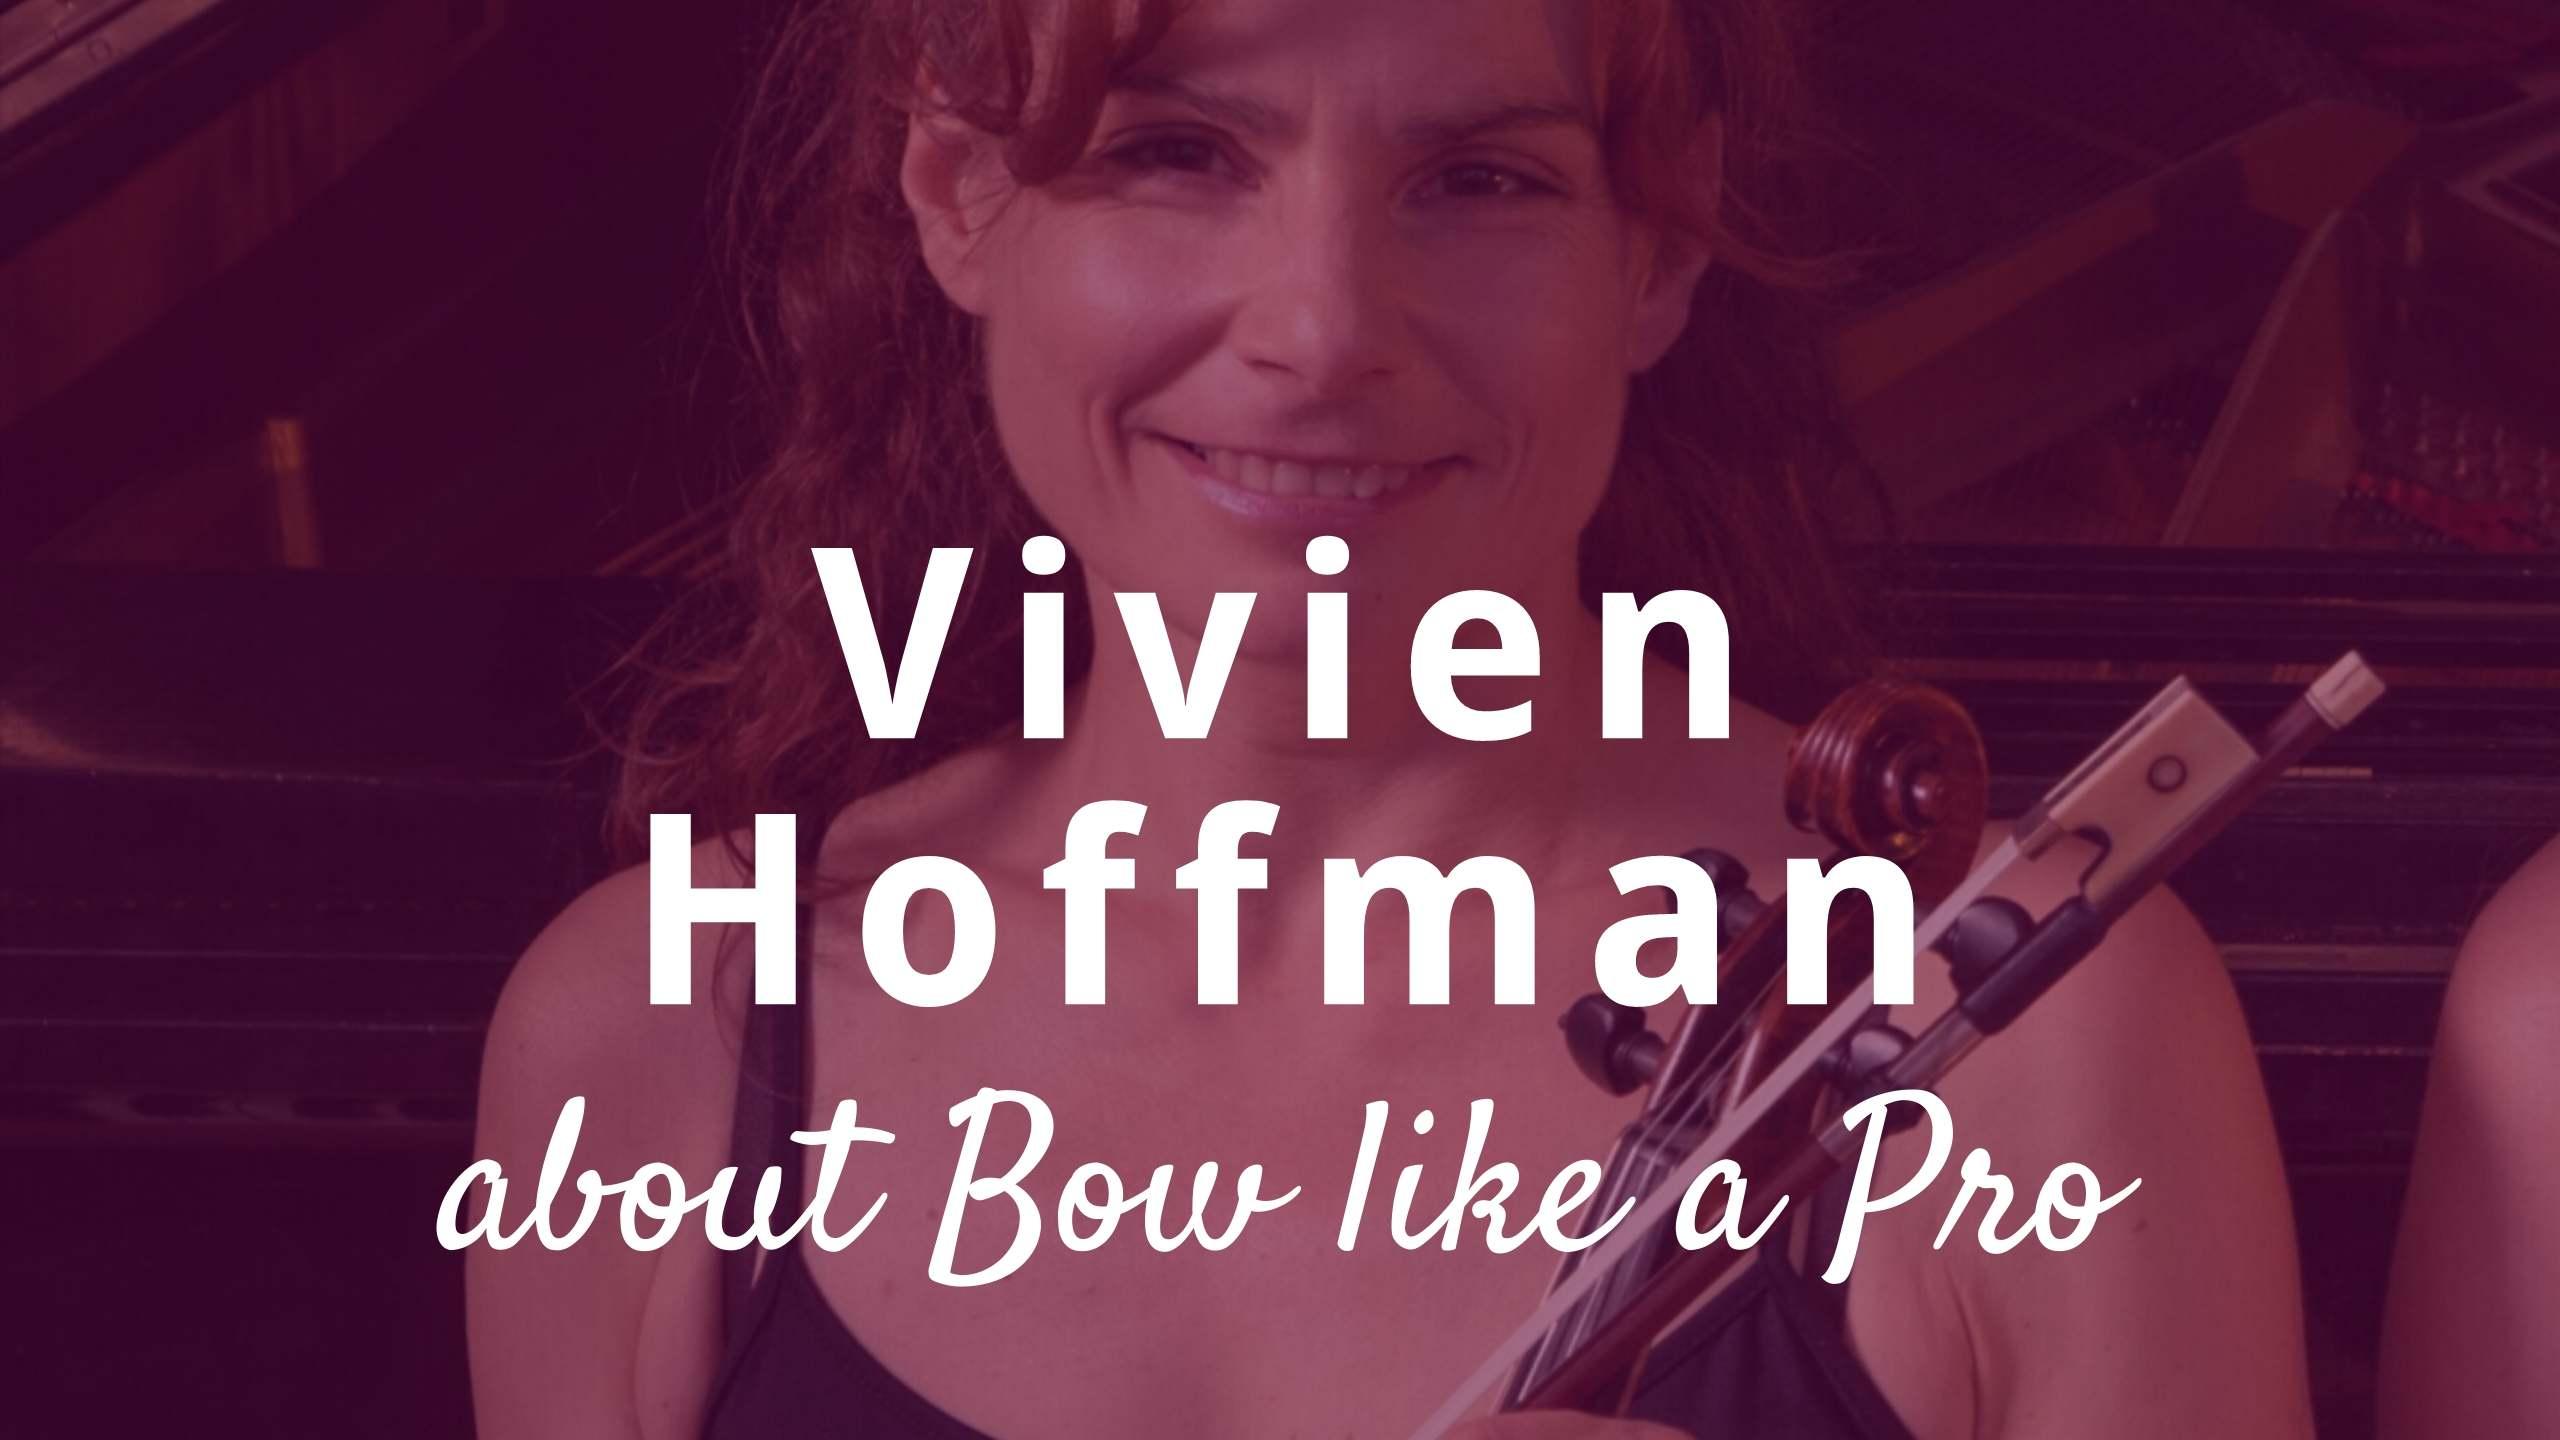 Violin lessons with concert violinist Vivien Hoffman